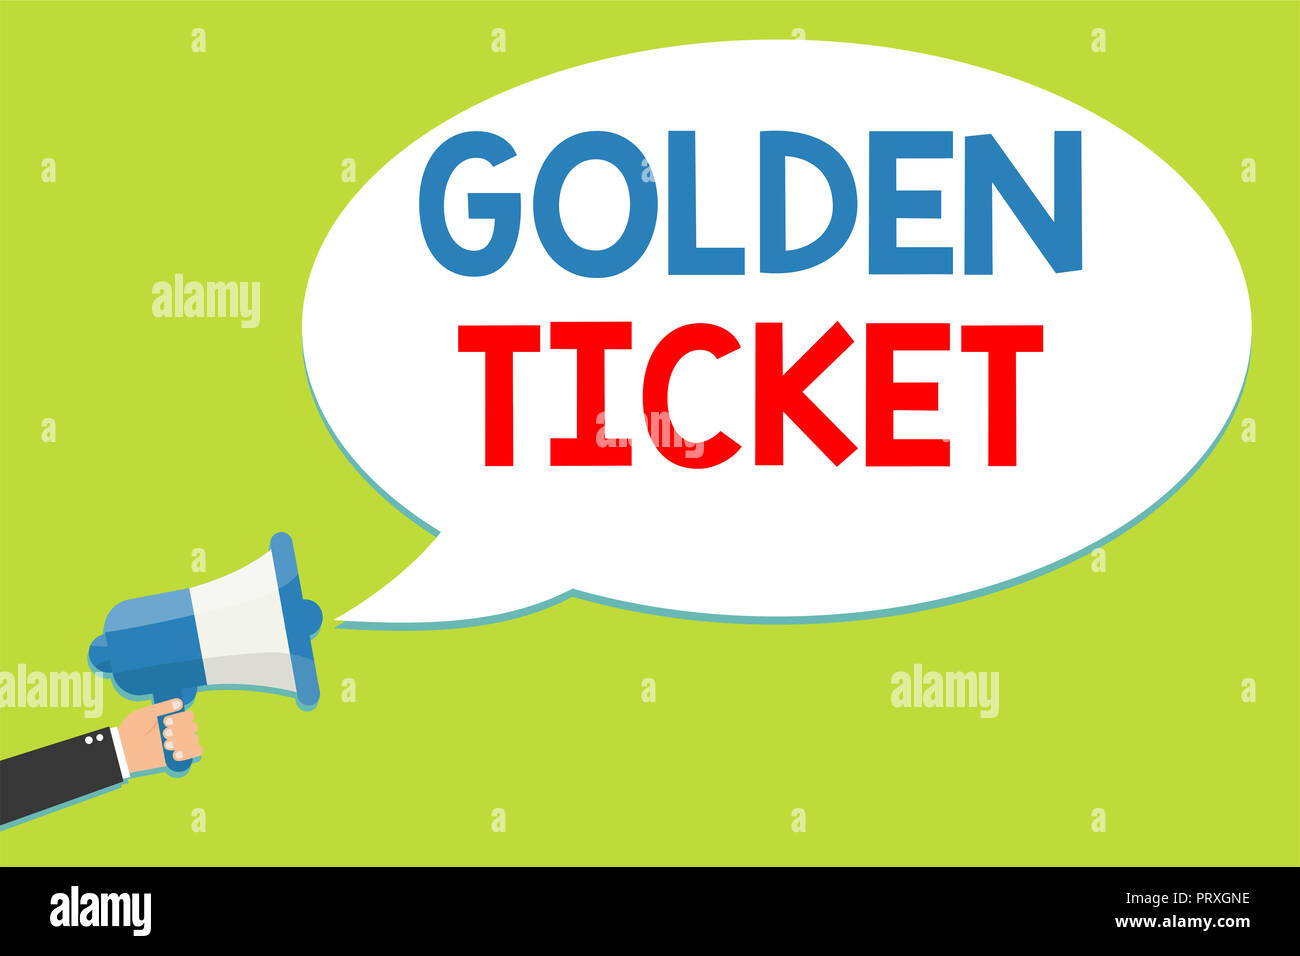 Word writing text Golden Ticket. Business concept for Rain Check Access VIP Passport Box Office Seat Event Man holding megaphone loudspeaker speech bu - Stock Image